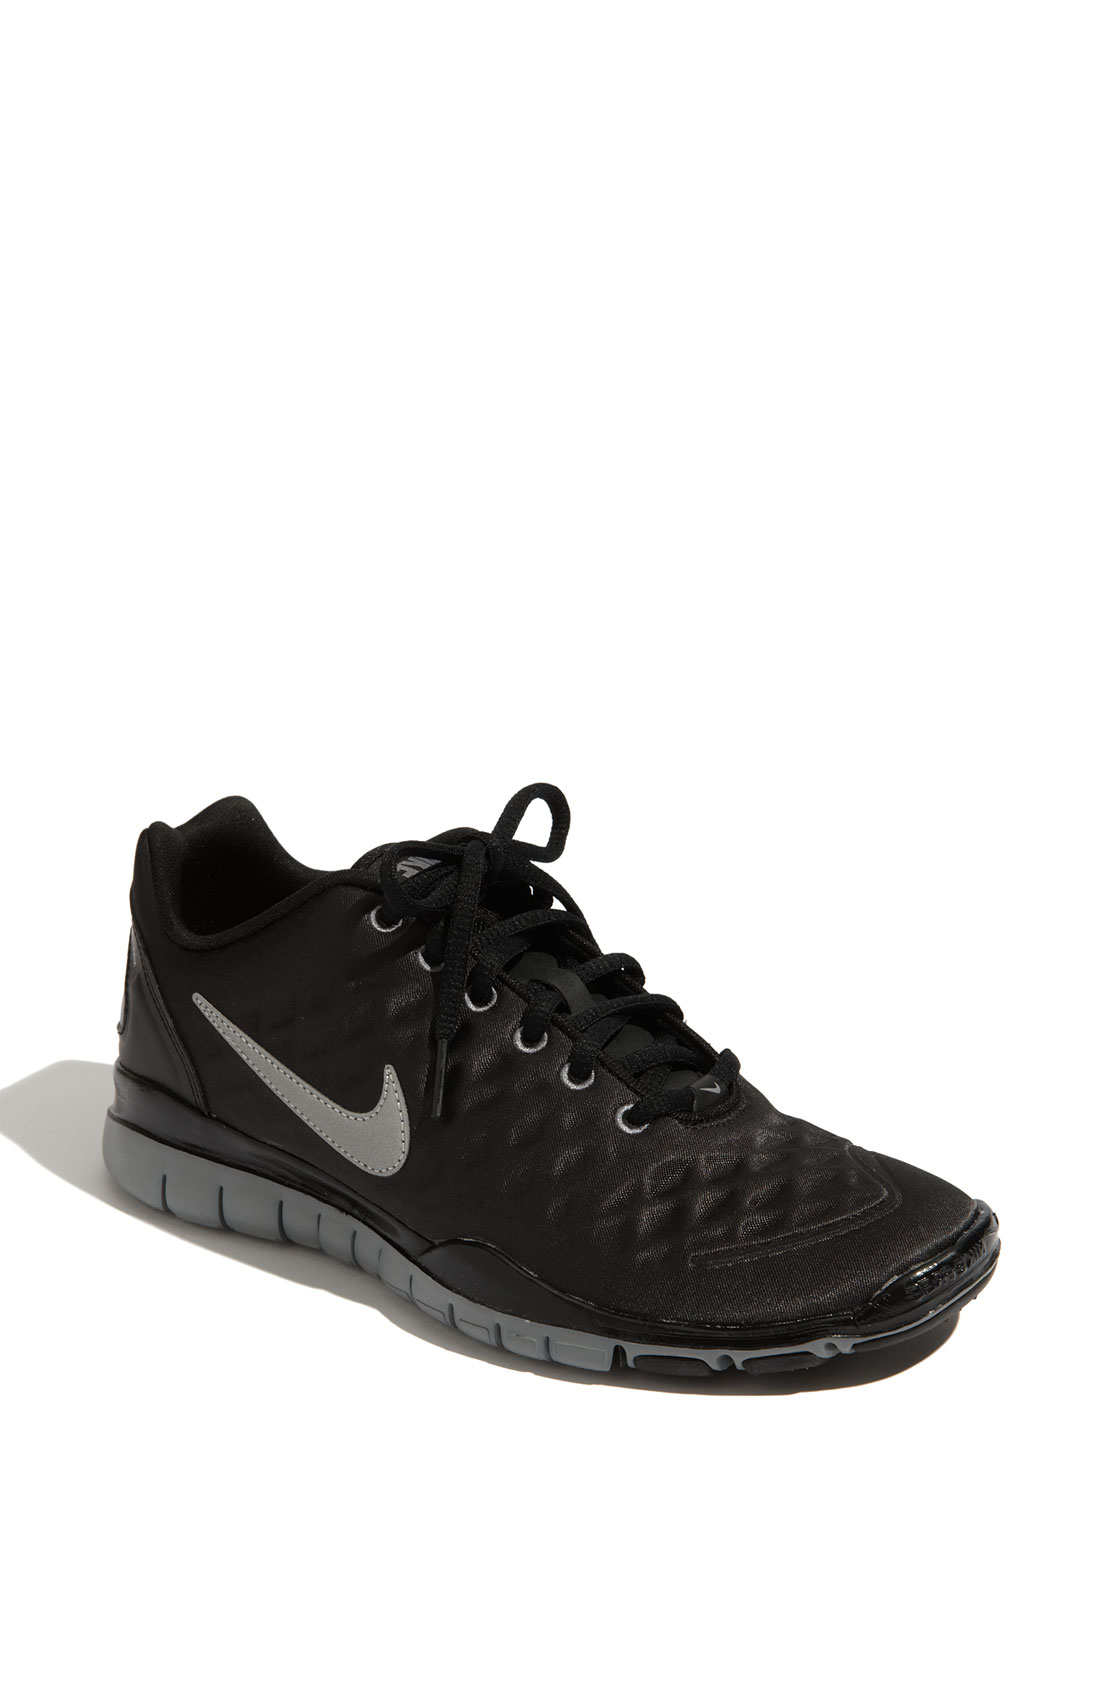 Brilliant Shoes Nike Rosherun Winter 685286 230 Casual Wmns Ultralight Sneakers